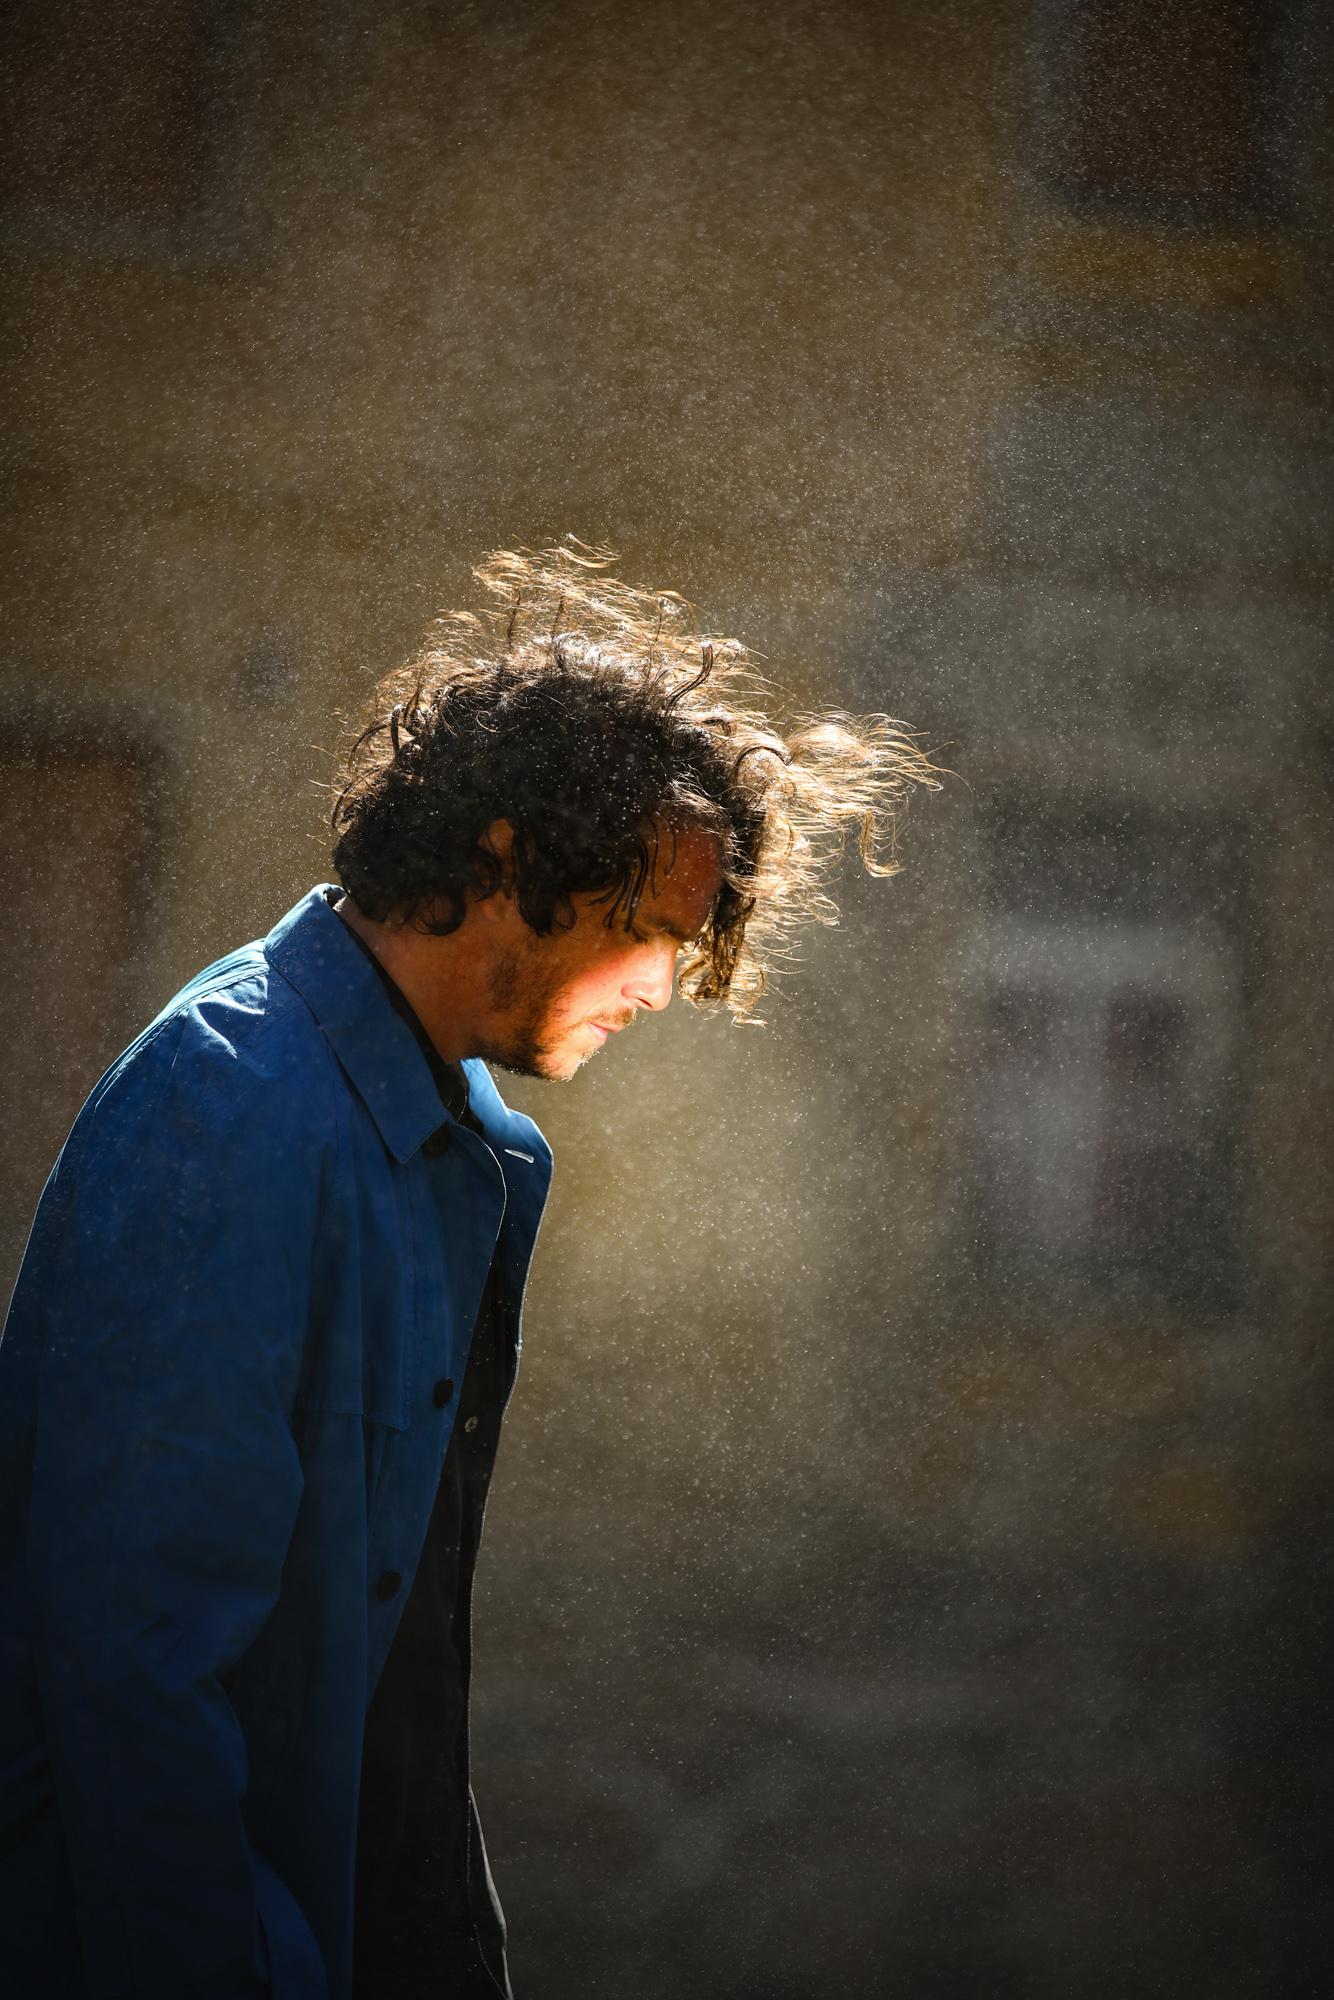 Ro Bergman, Pic by: Peter Rigaud